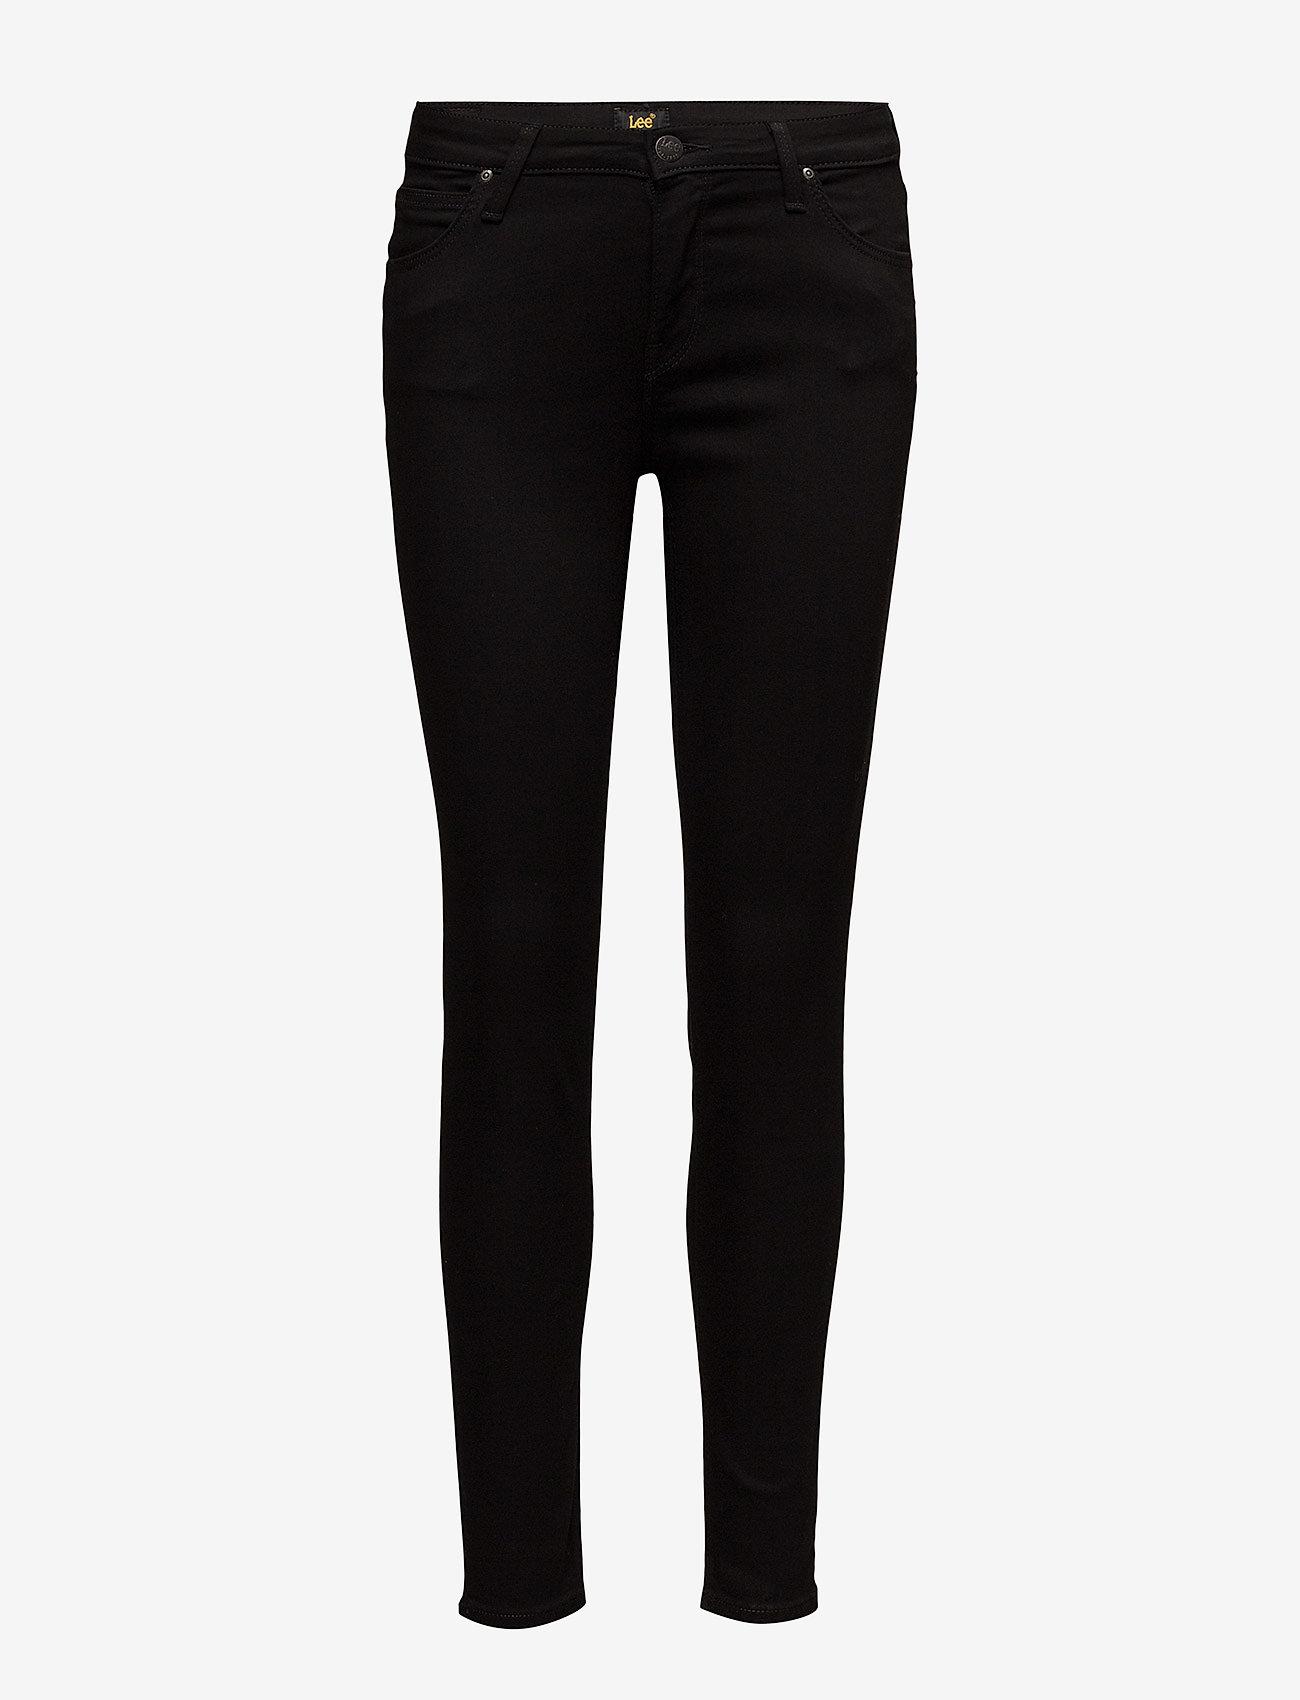 Lee Jeans - SCARLETT - skinny jeans - black rinse - 1